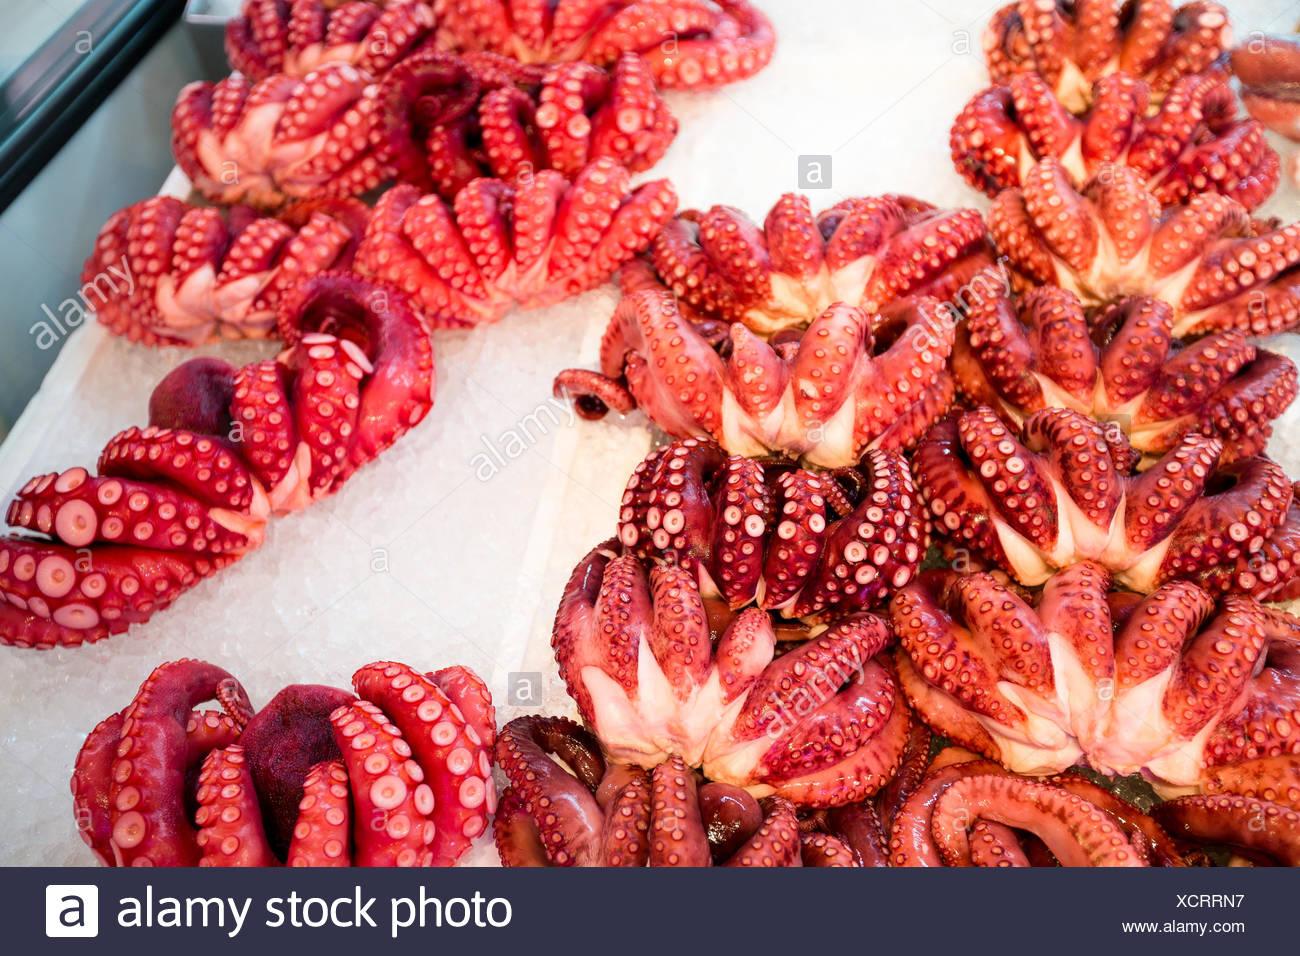 octopus-in-japanese-food-market-XCRRN7.j